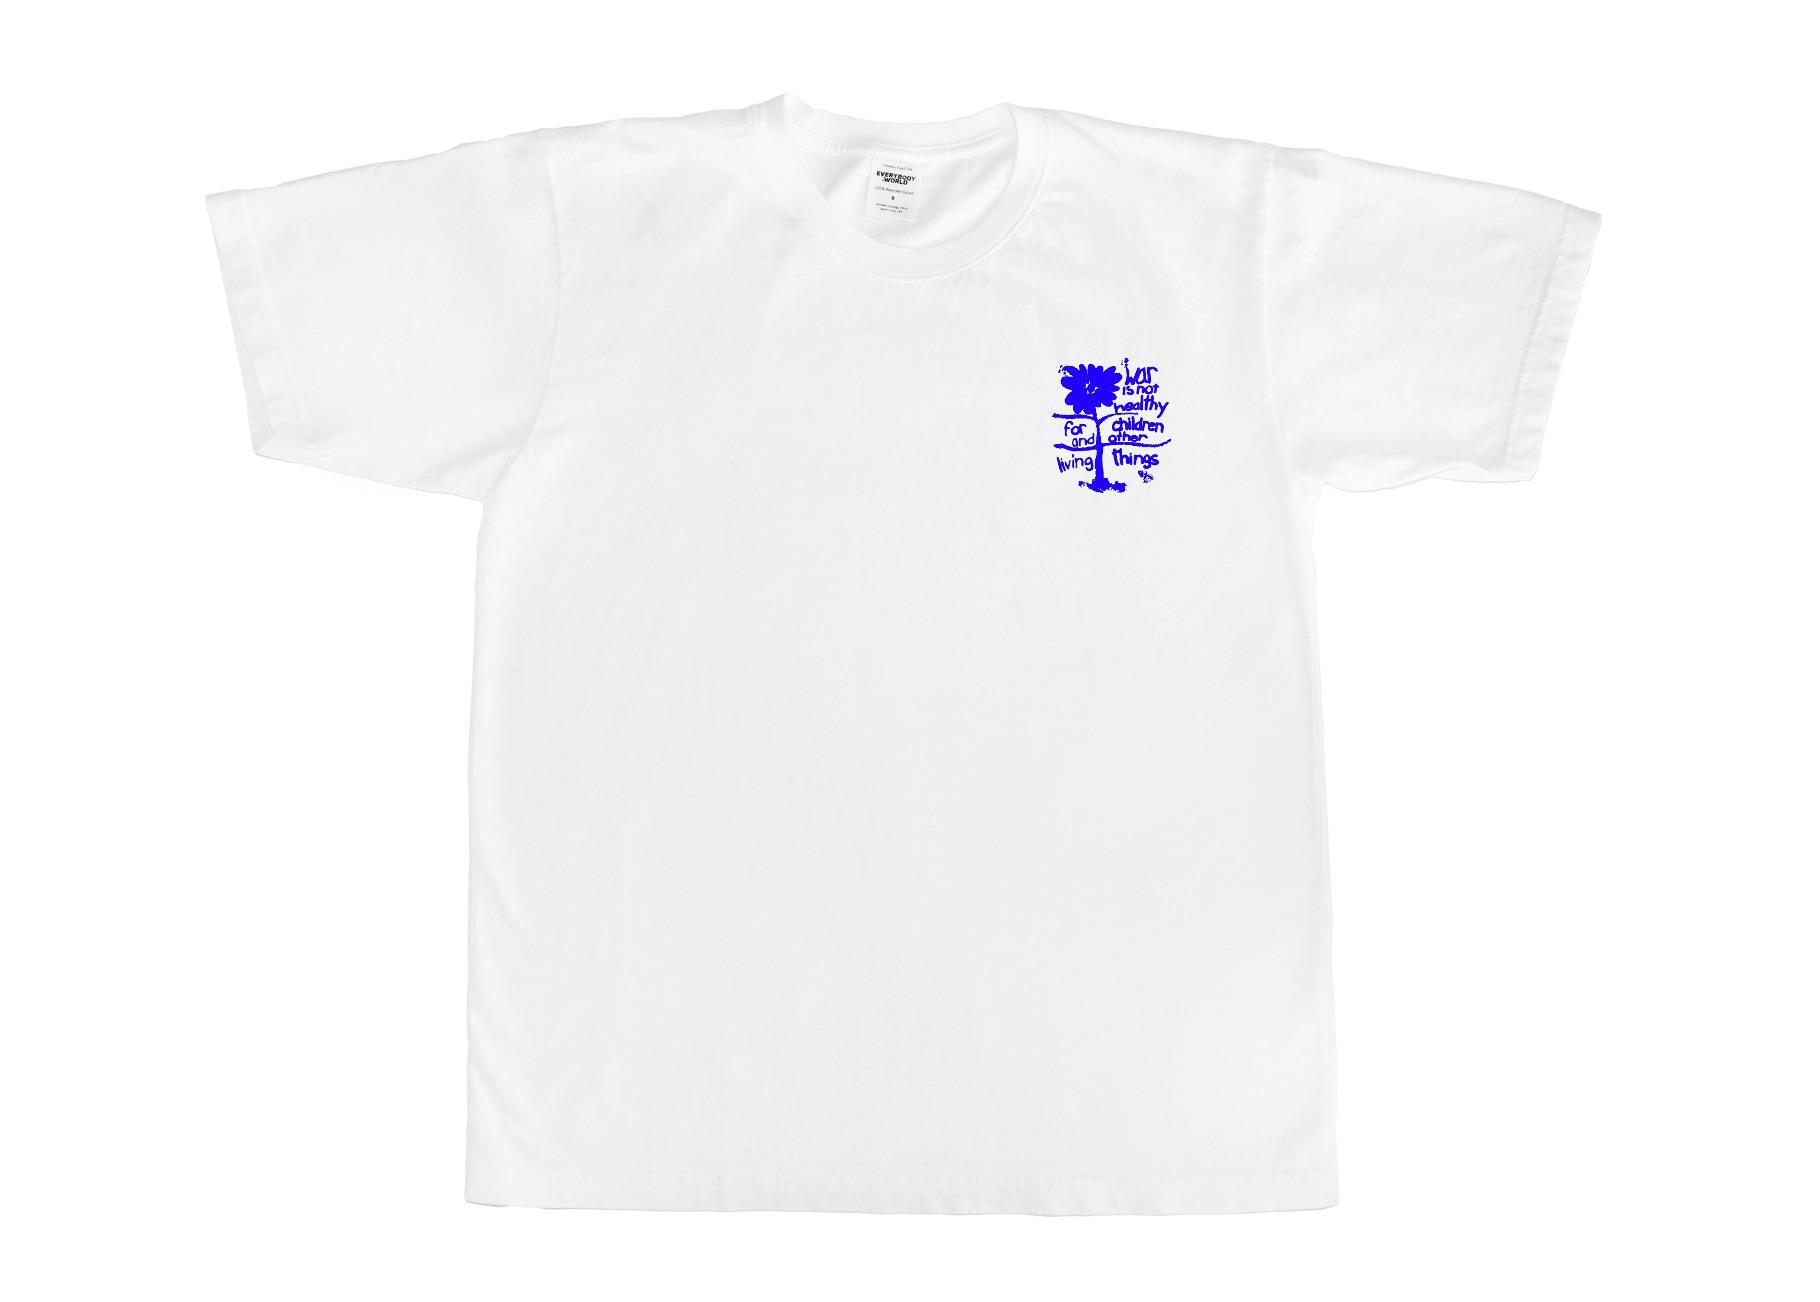 B. Thom Stevenson T-shirt Front.jpeg